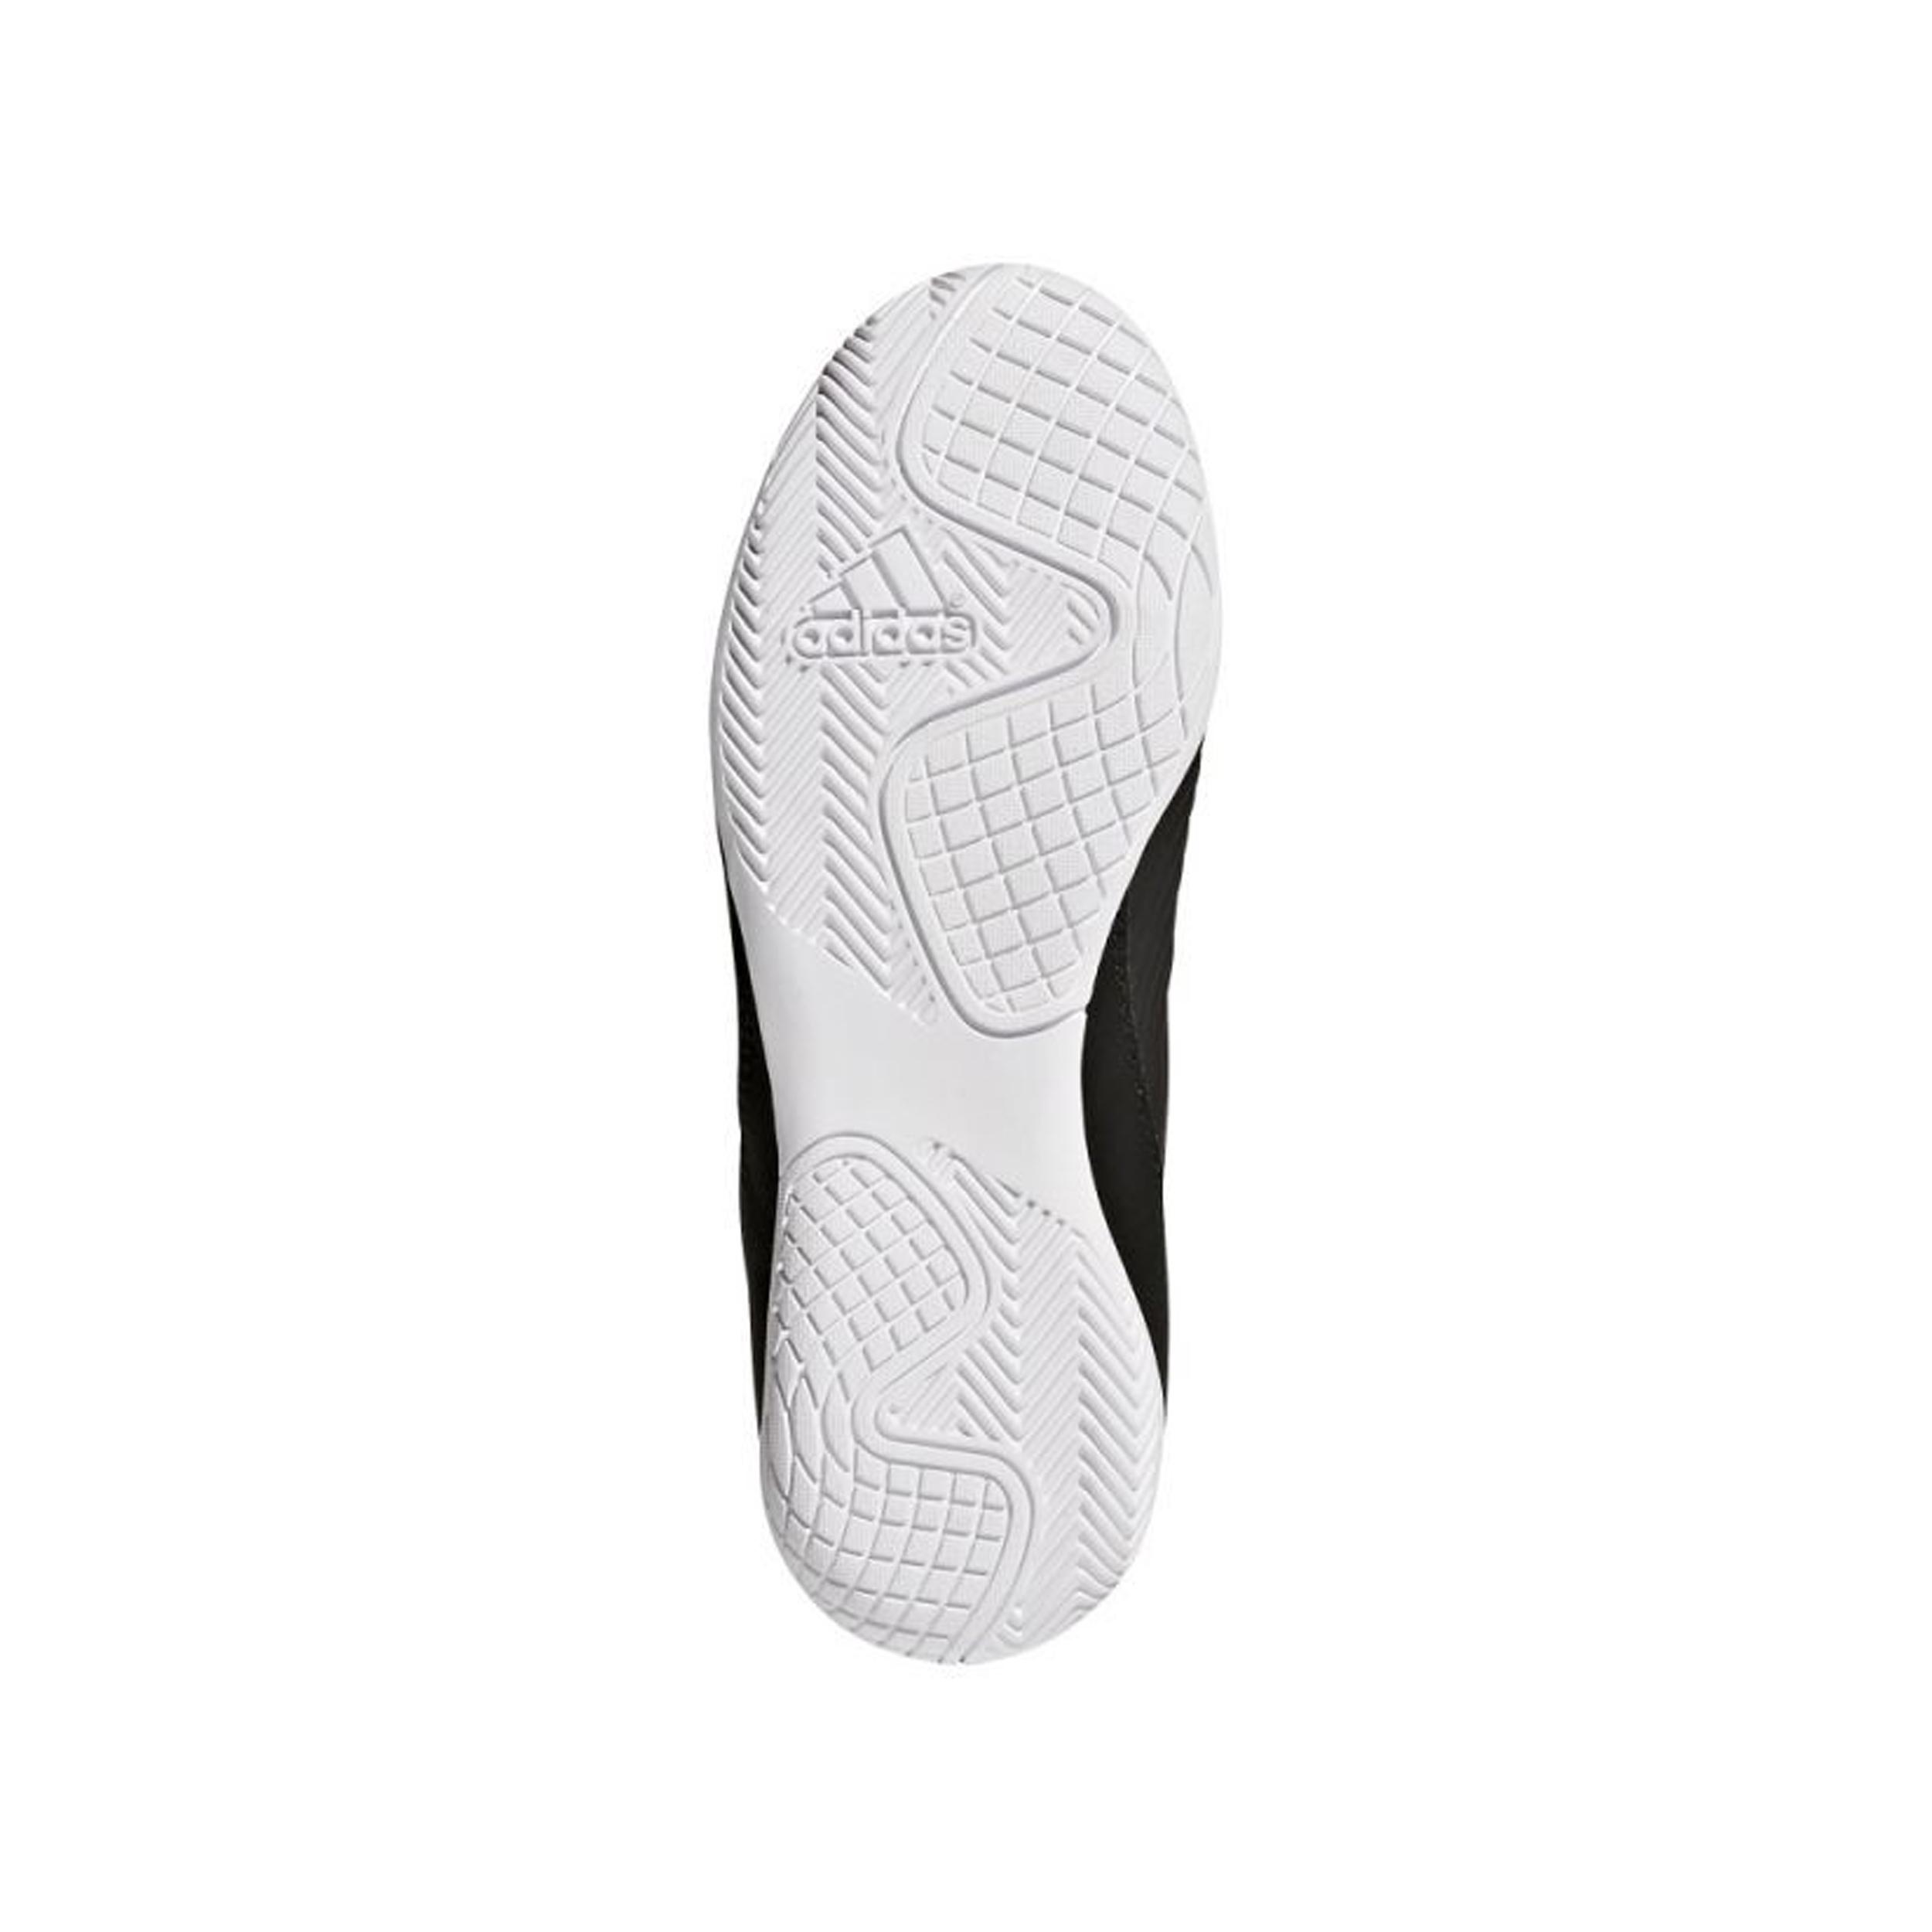 کفش مخصوص فوتسال پسرانه آدیداس سری Predator مدل CP9076 main 1 2